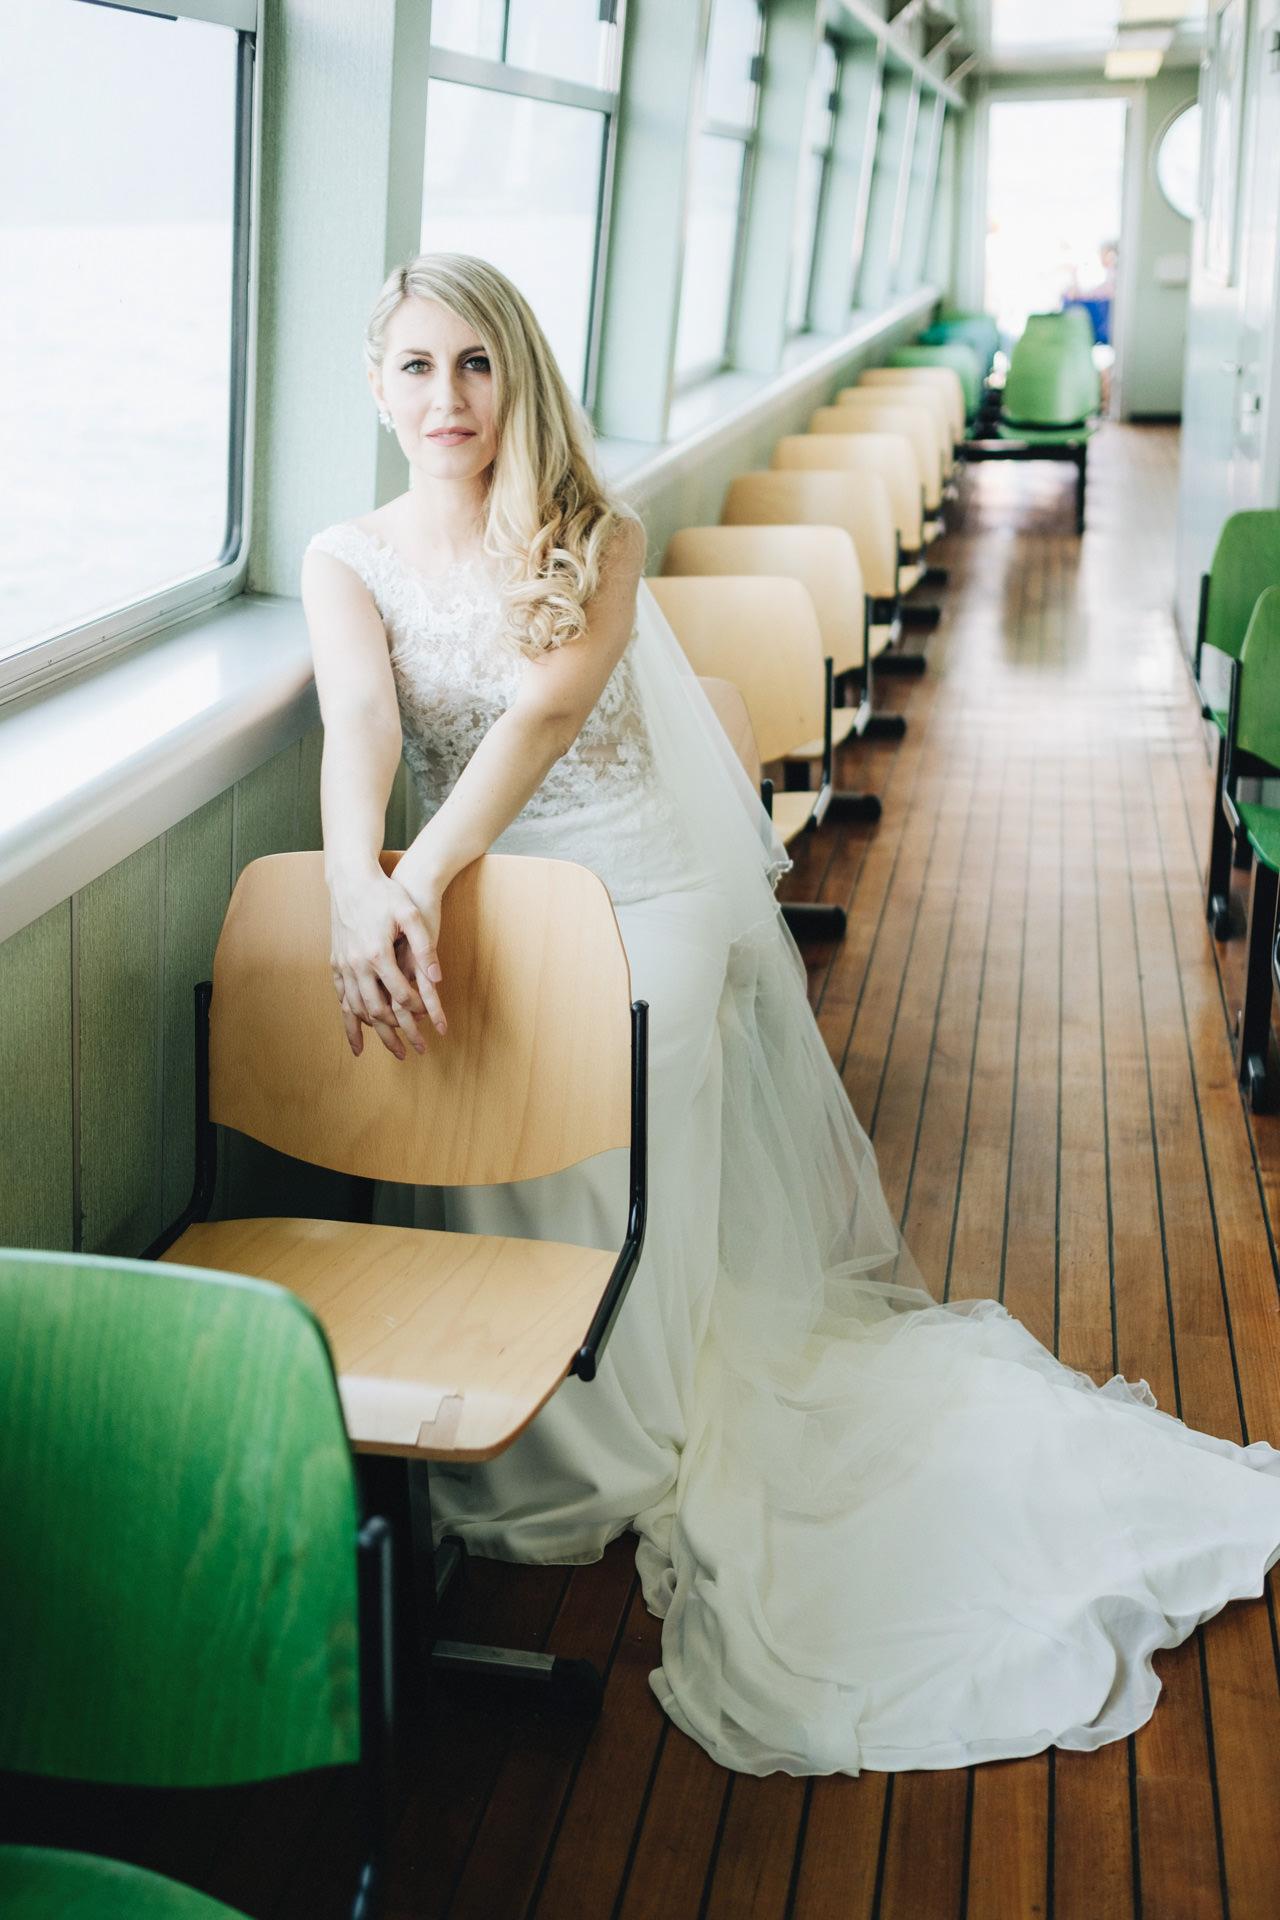 fotografi di matrimonio-62.jpg